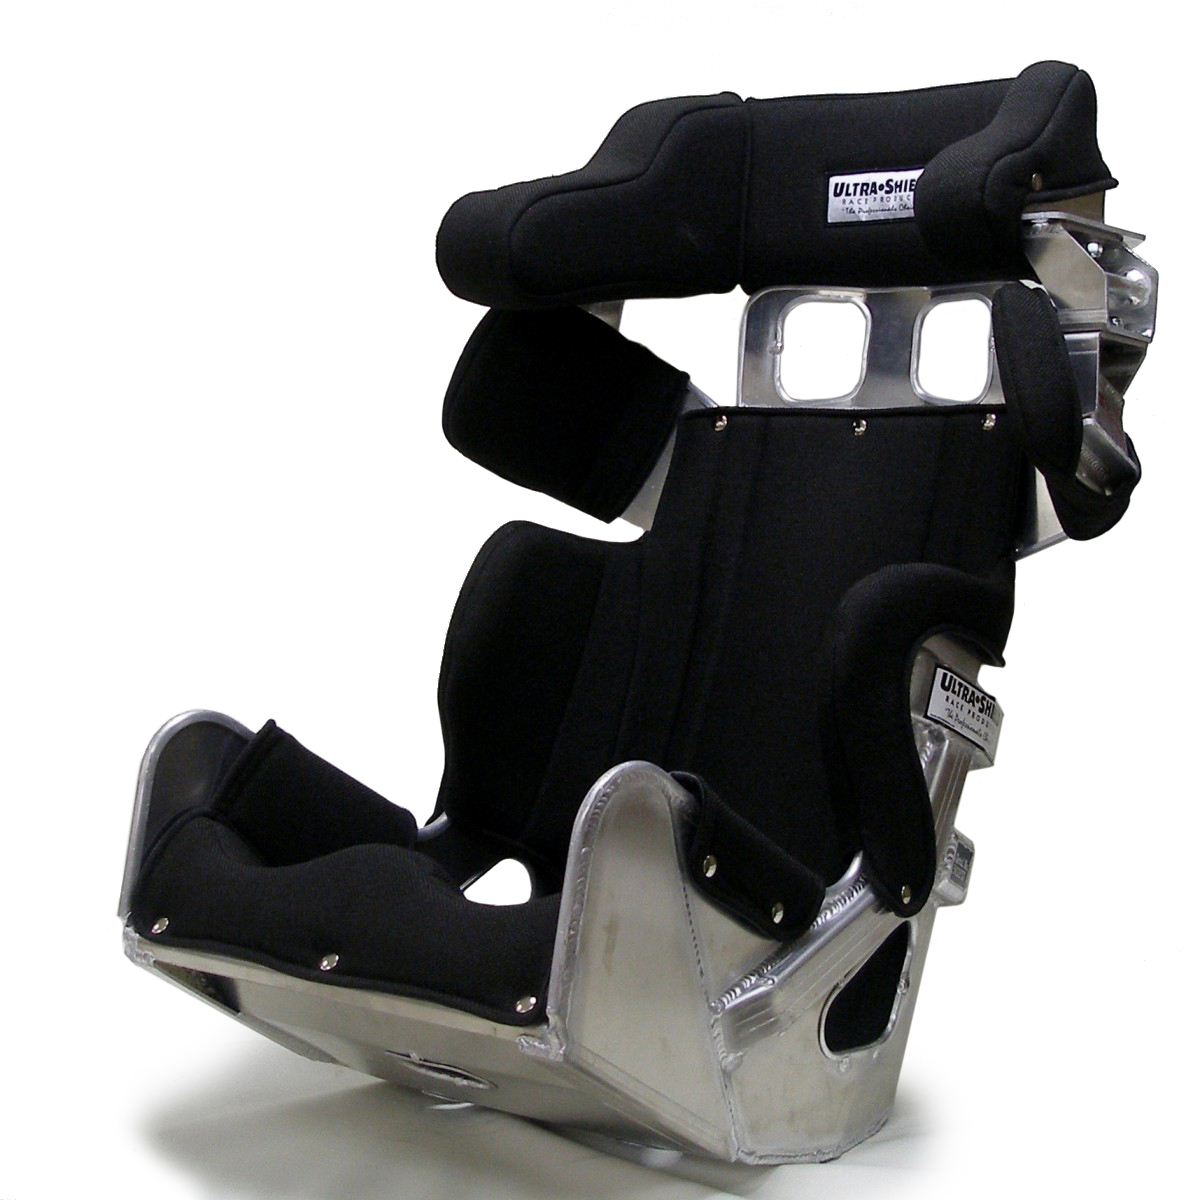 15.5in Seat W/CVR 20 Deg LM SFI 39.2 Contain